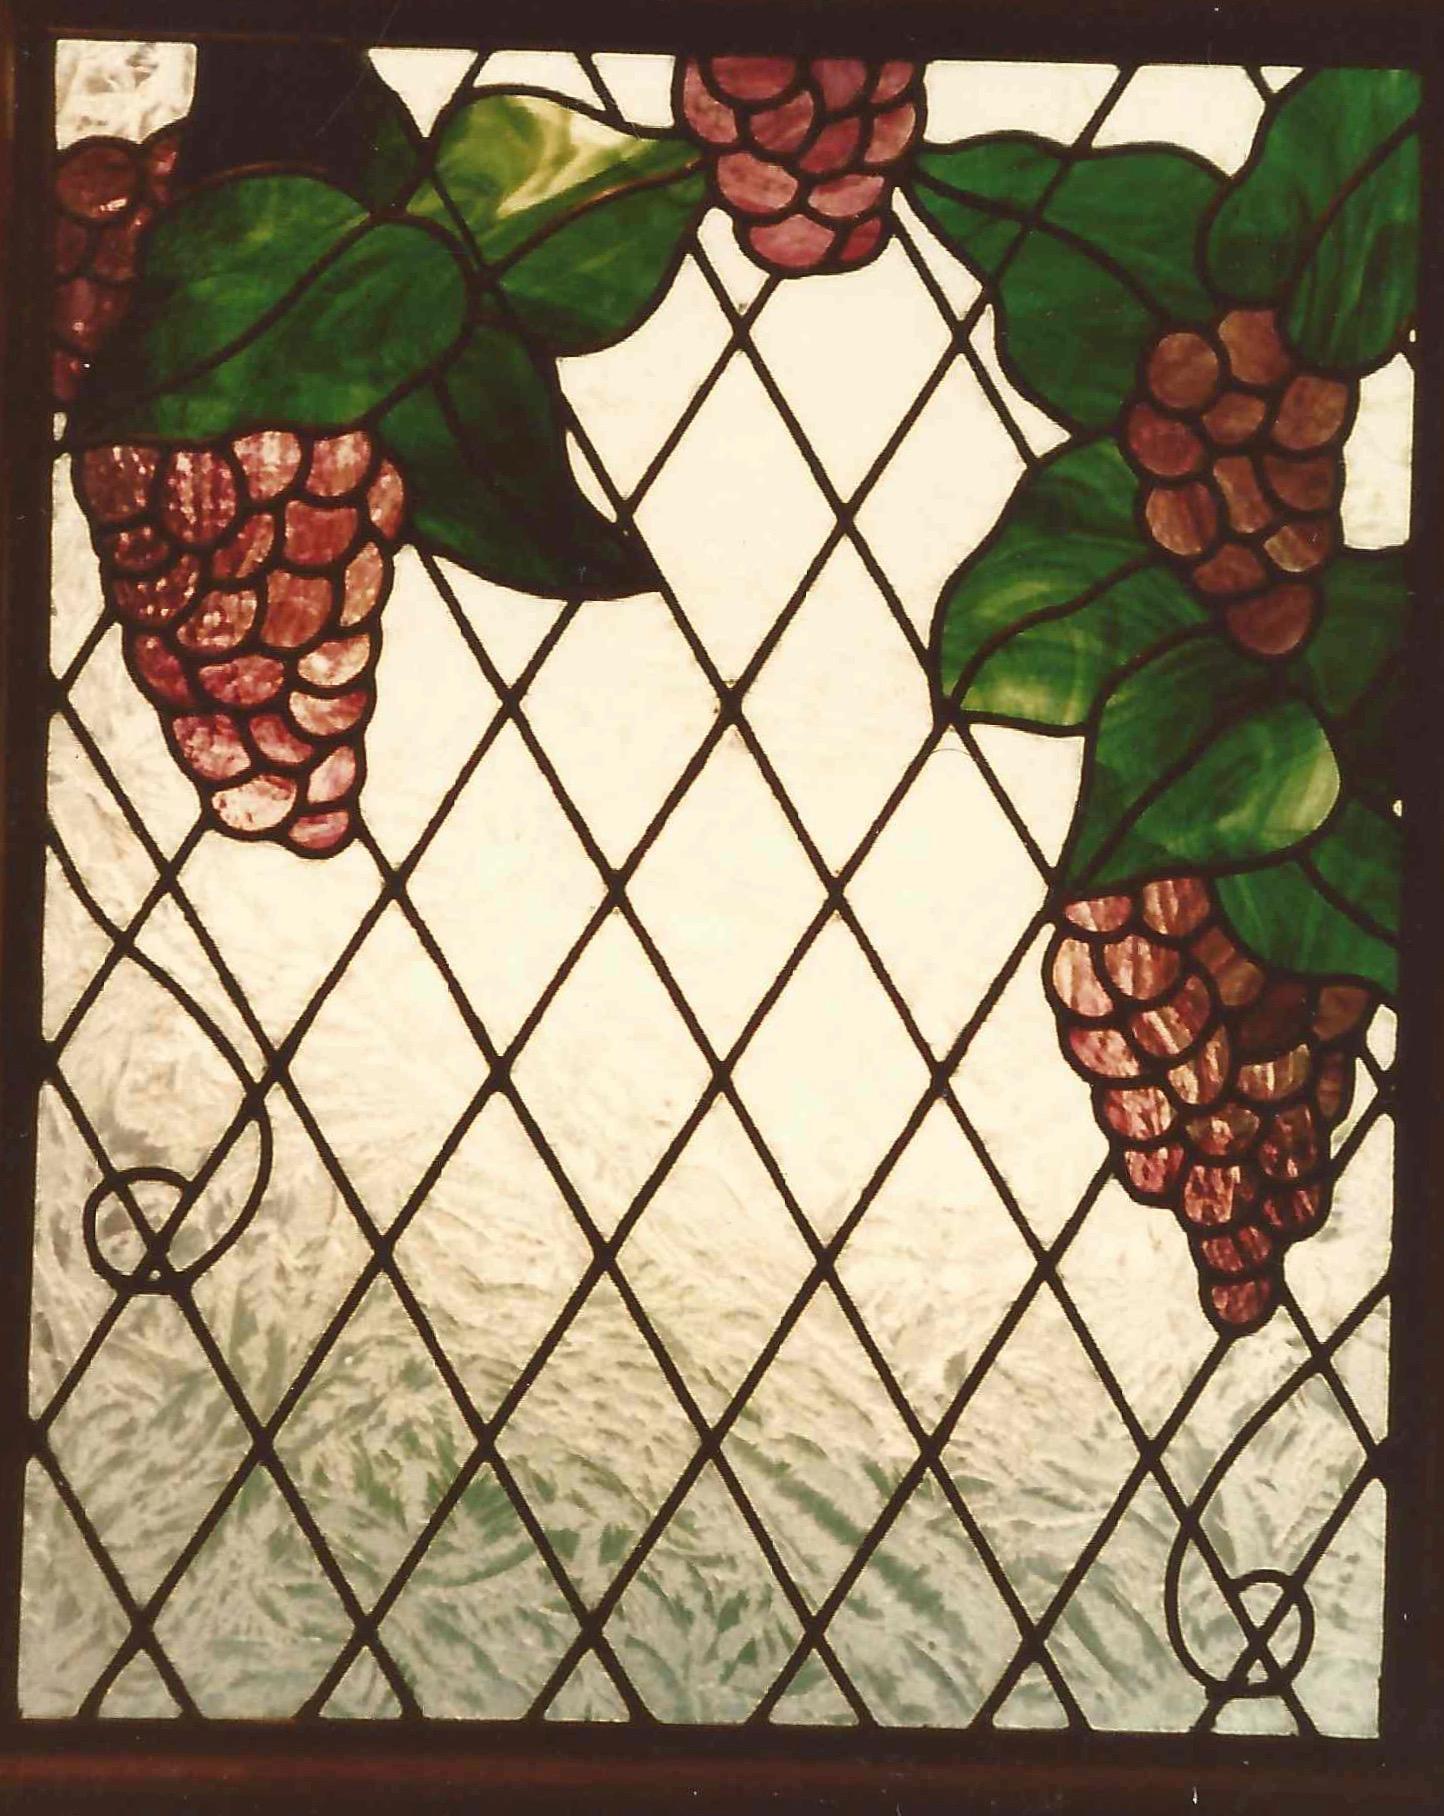 25.grapes